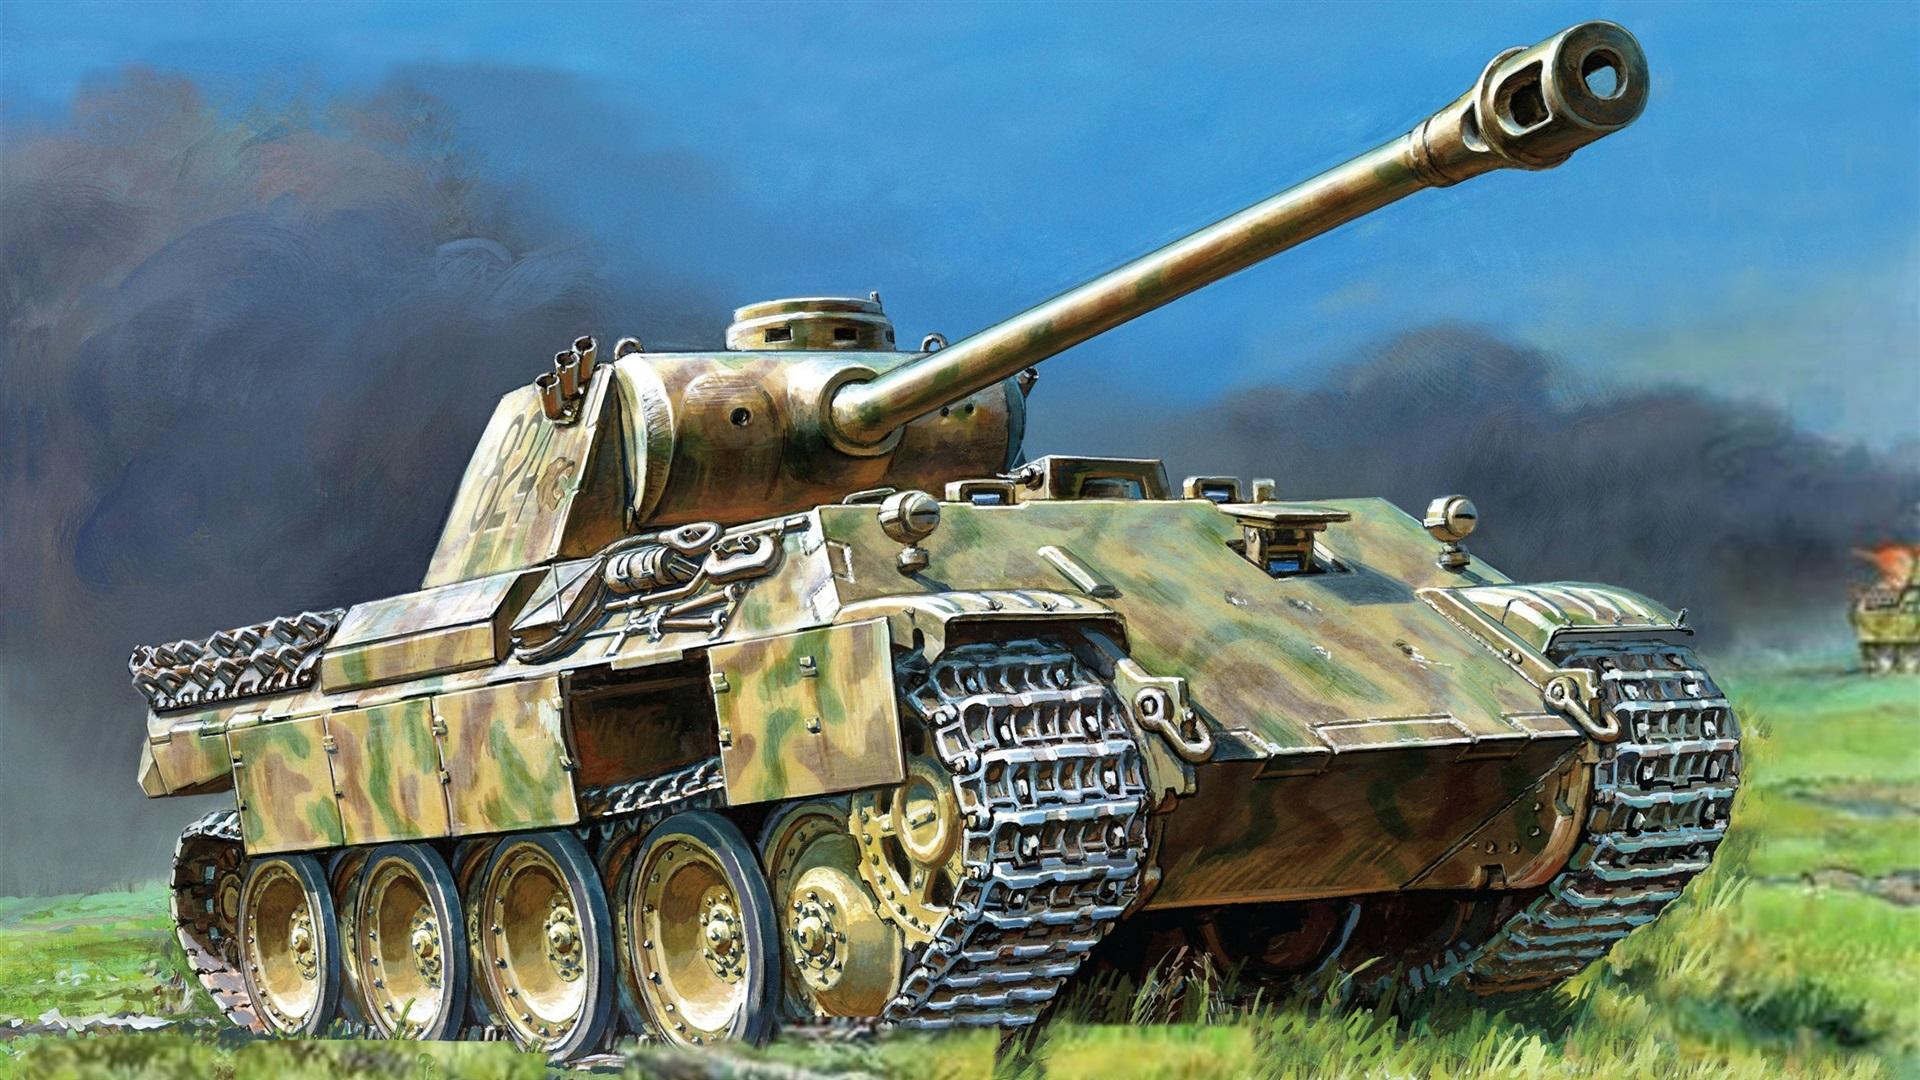 panther tank wallpaper hd - photo #10